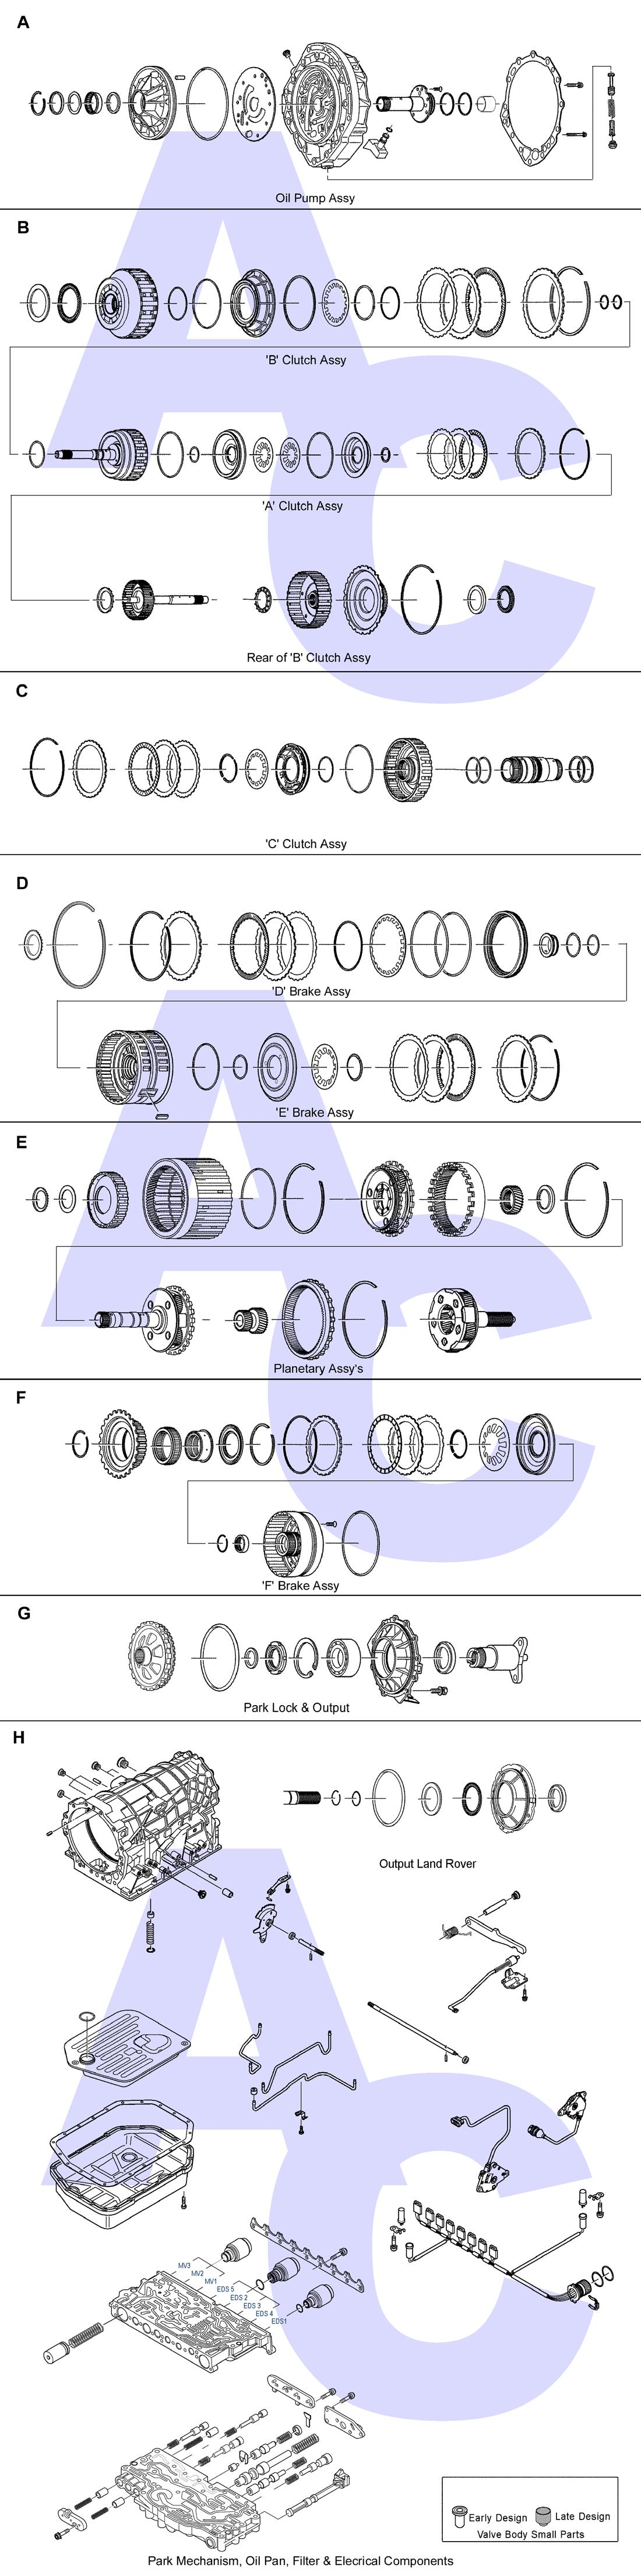 5HP24 Automatic Transmission Parts Catalogue - Automatic Choice